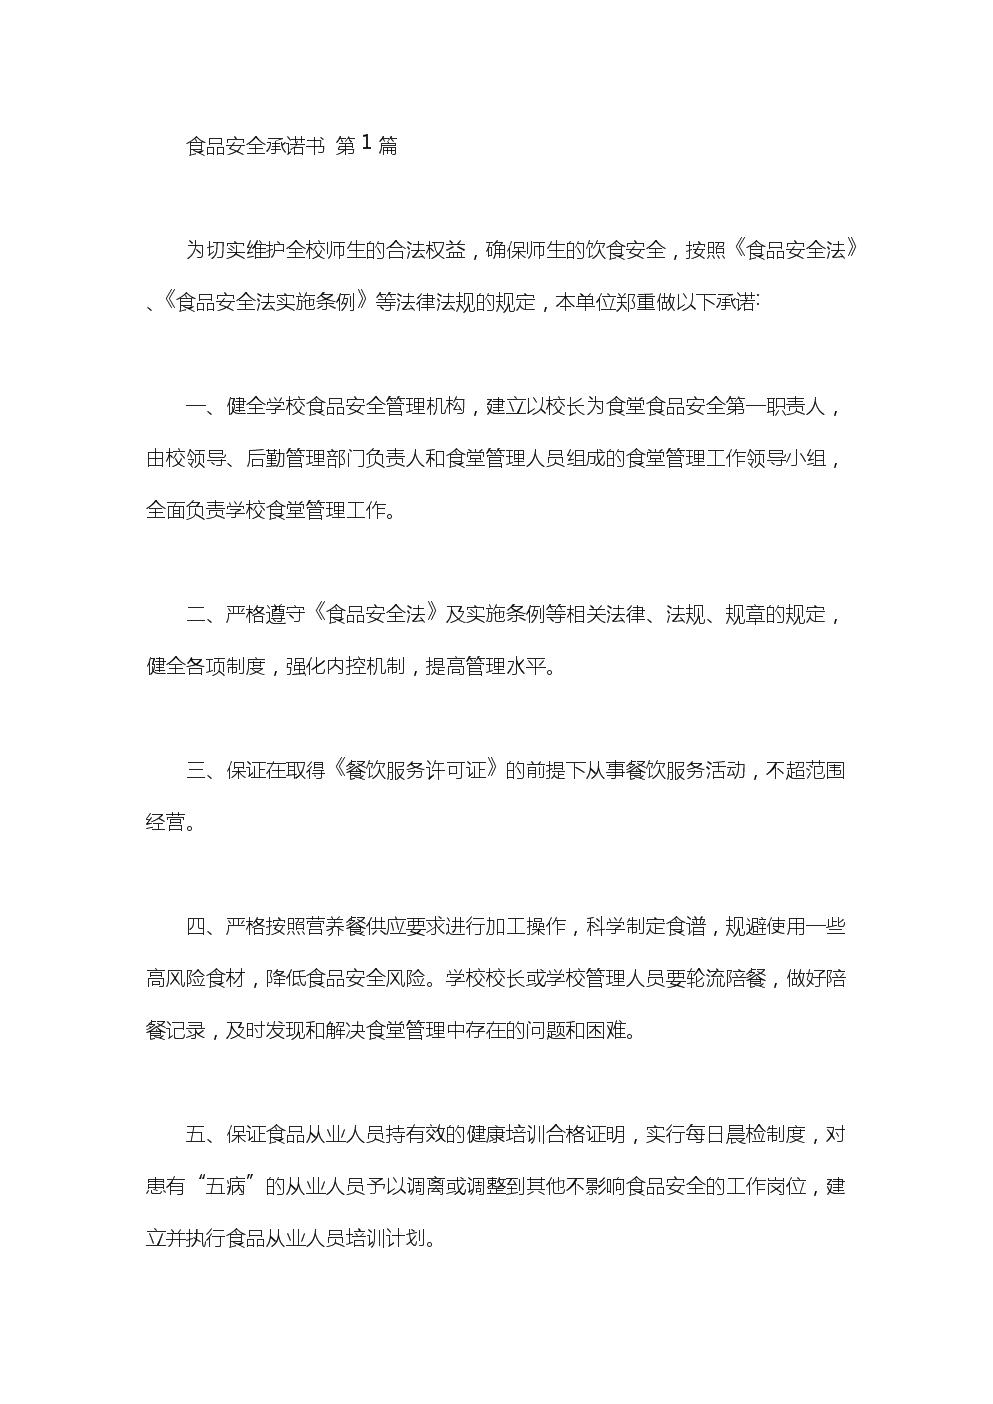 食品安全承诺书(15篇汇总).doc